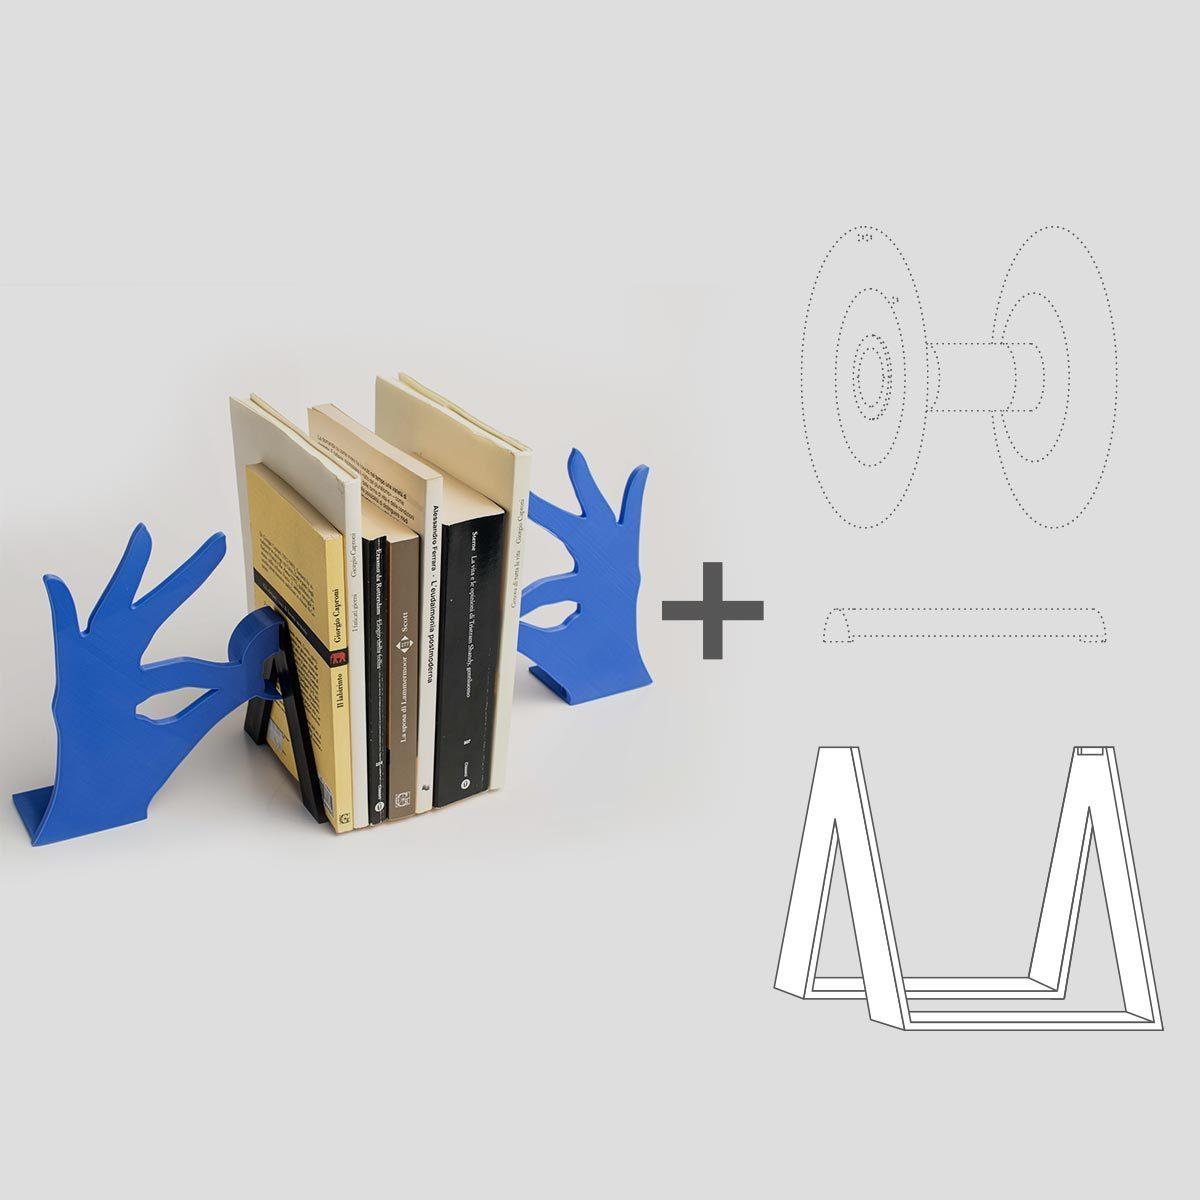 Biblio_02.jpg Download free STL file Biblio - Bookends • 3D printable model, EUMAKERS